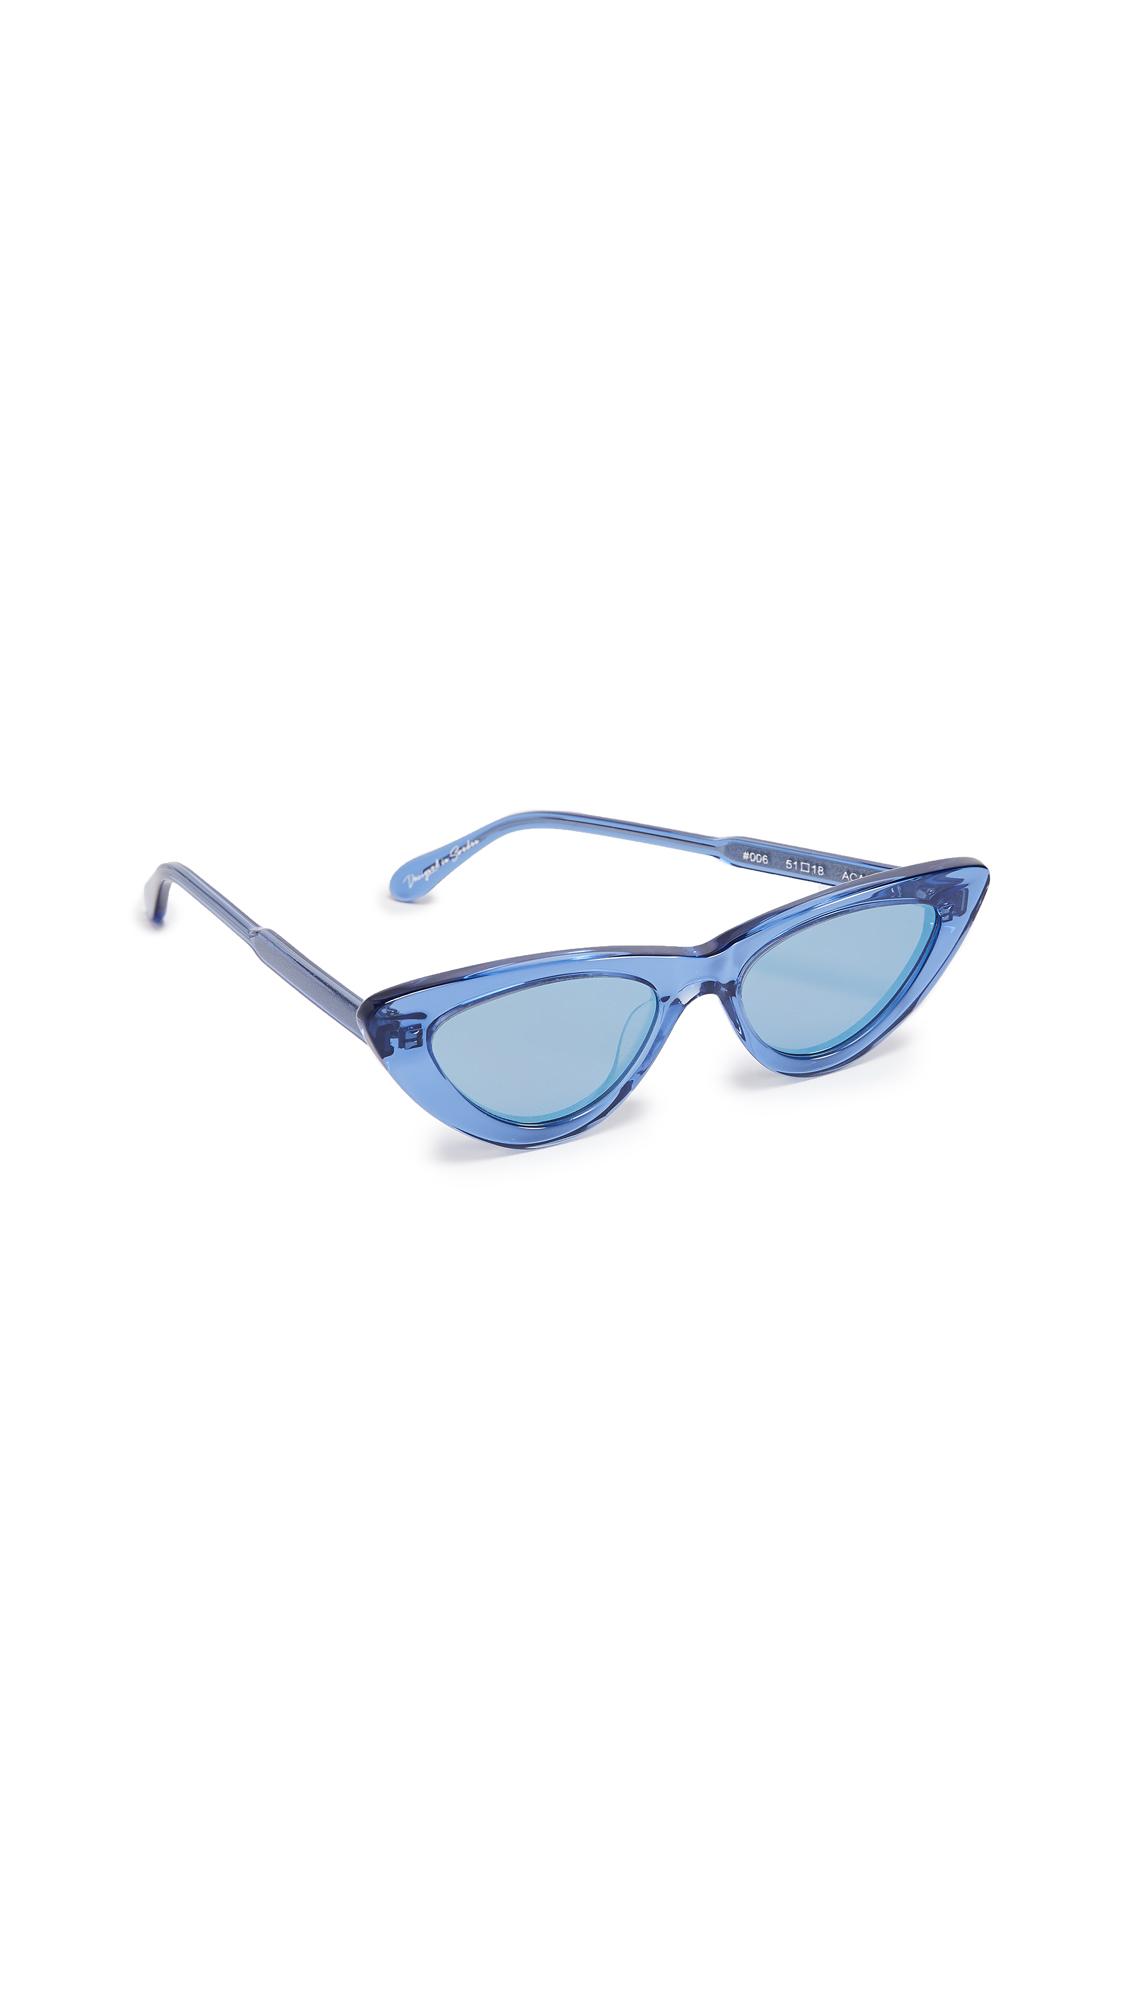 CHIMI 006 Sunglasses in Acai